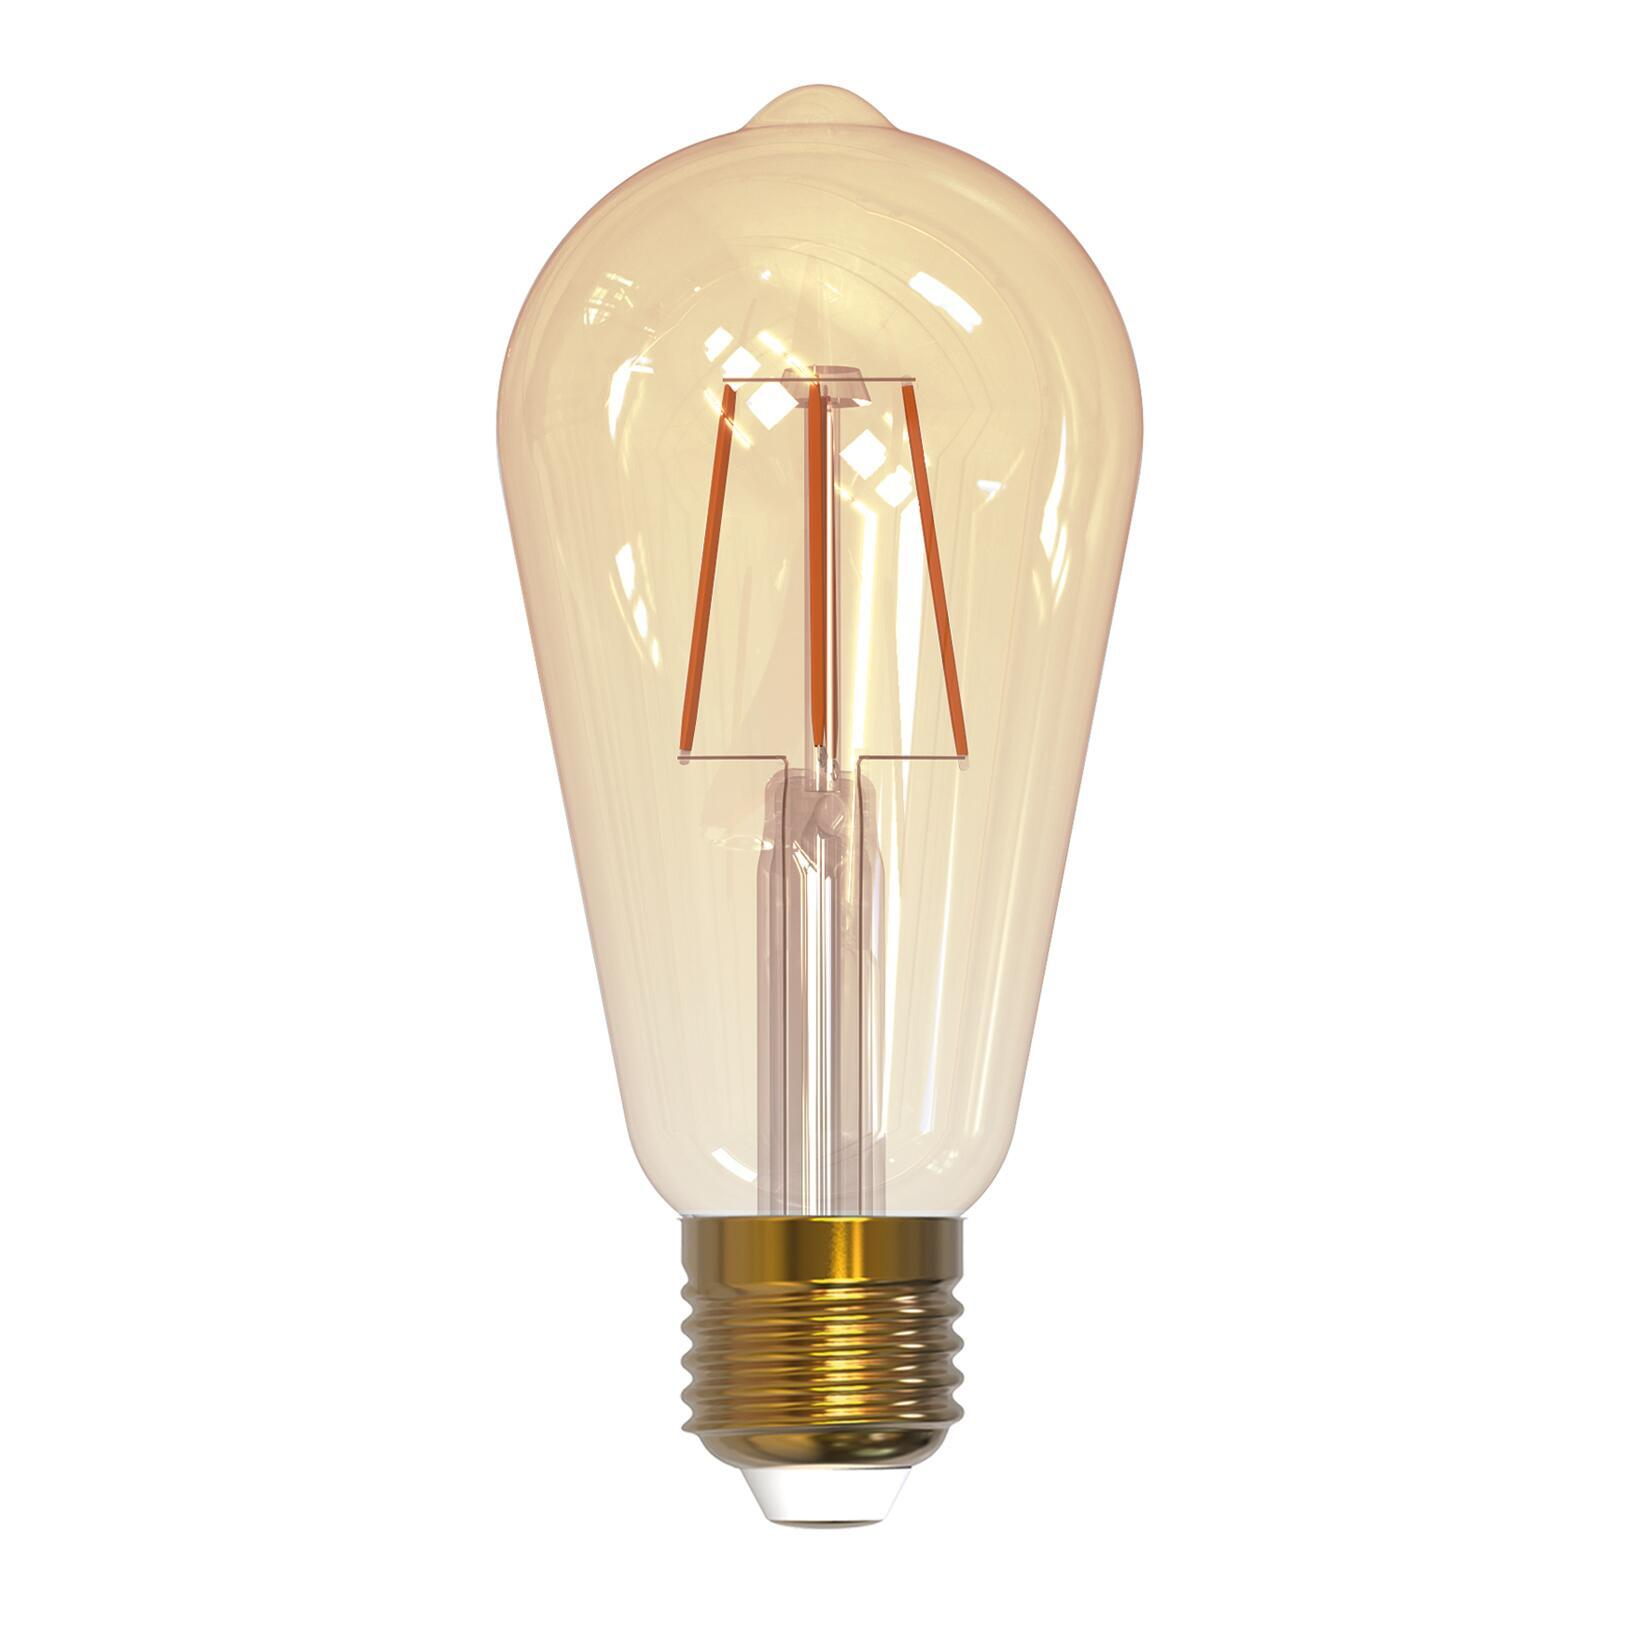 Lampadina smart lighting LED filamento, E27, Goccia, Fumé, Luce calda, 7W=600LM (equiv 7 W), 360° - 1